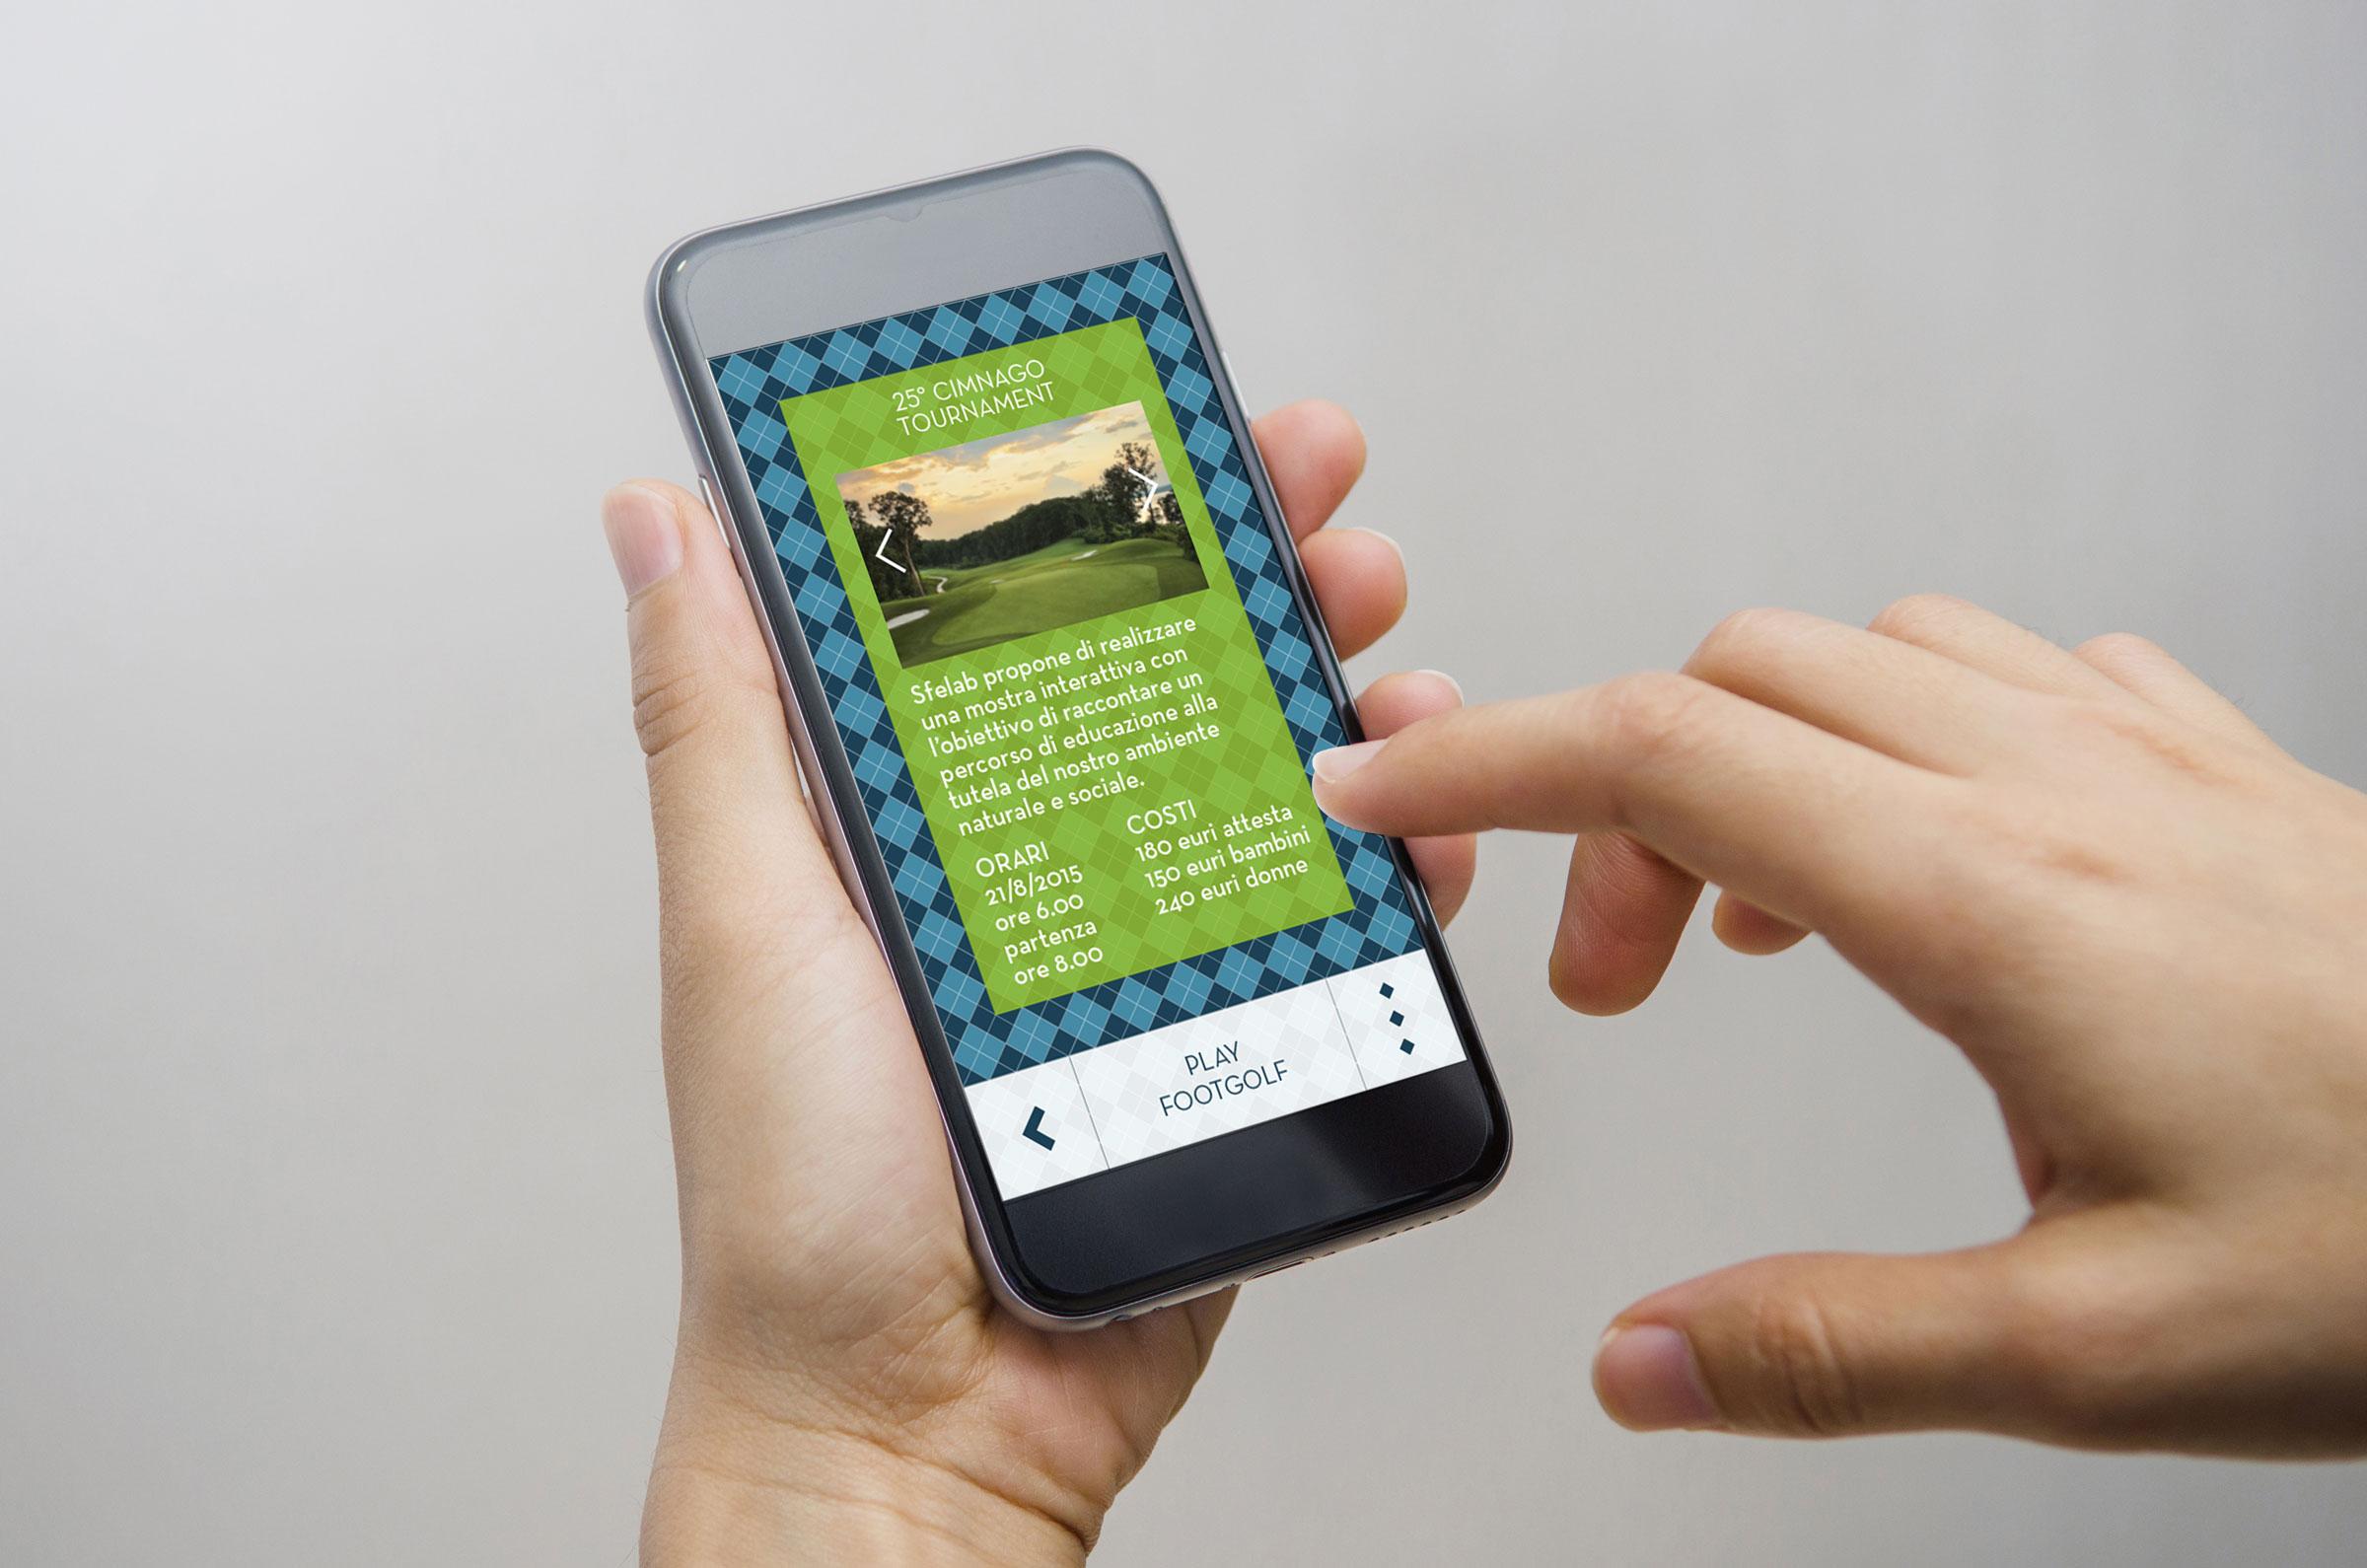 applicazione web Android iOS